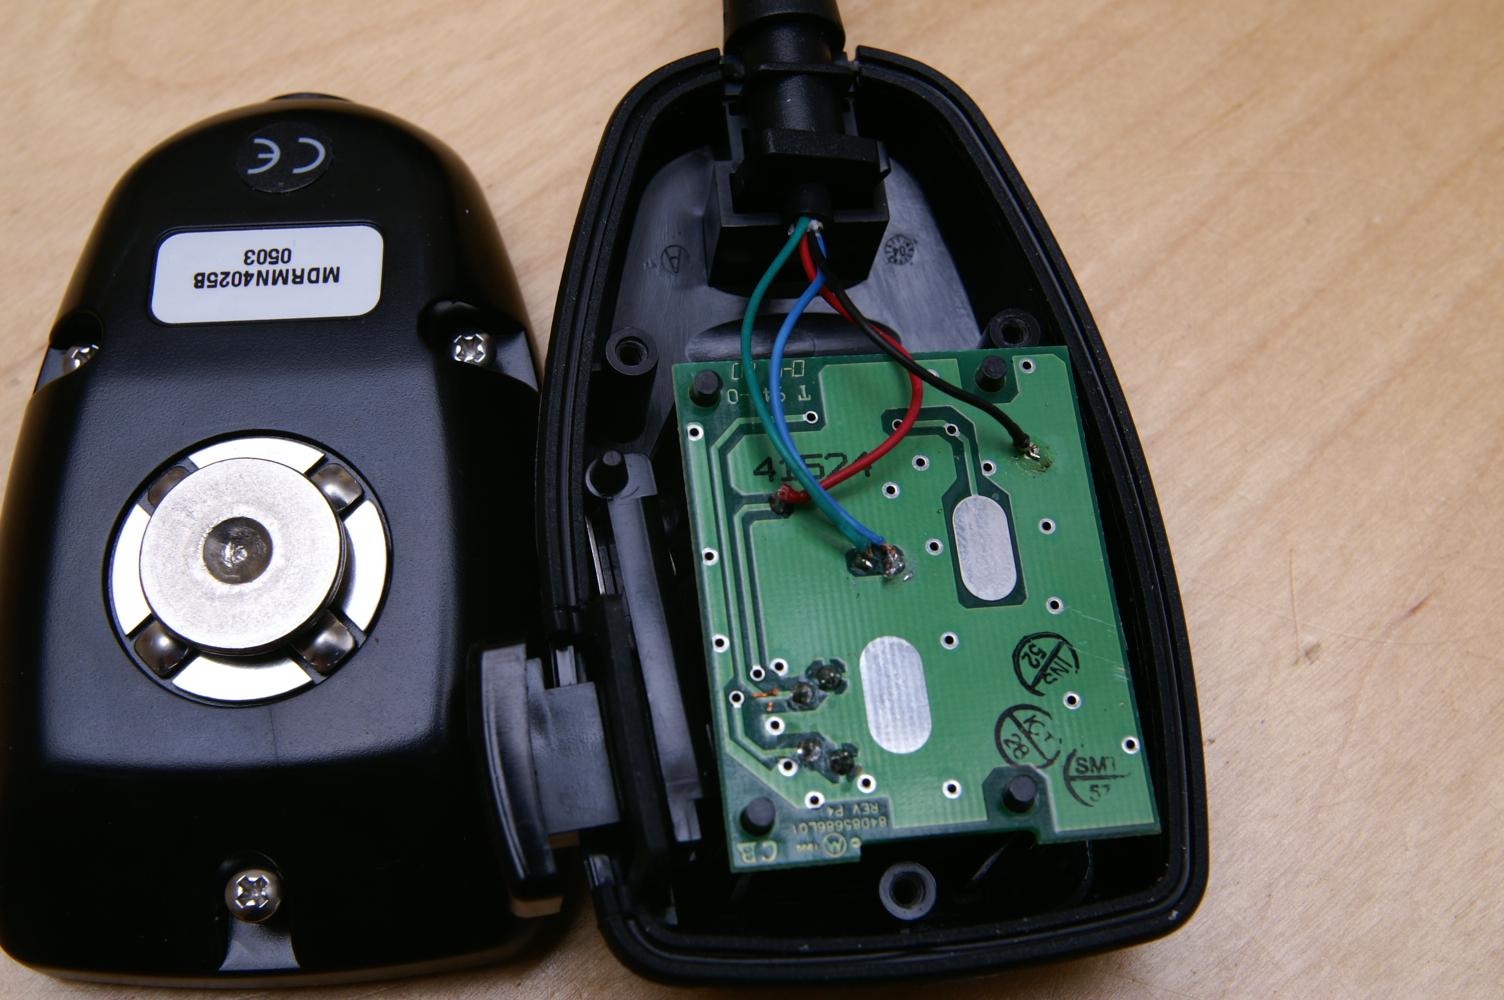 motorola mdrmn4025b mod rh the devil made me do it nl Motorola XTL 5000 Wiring-Diagram Motorola CDM1250 Microphone Wiring-Diagram